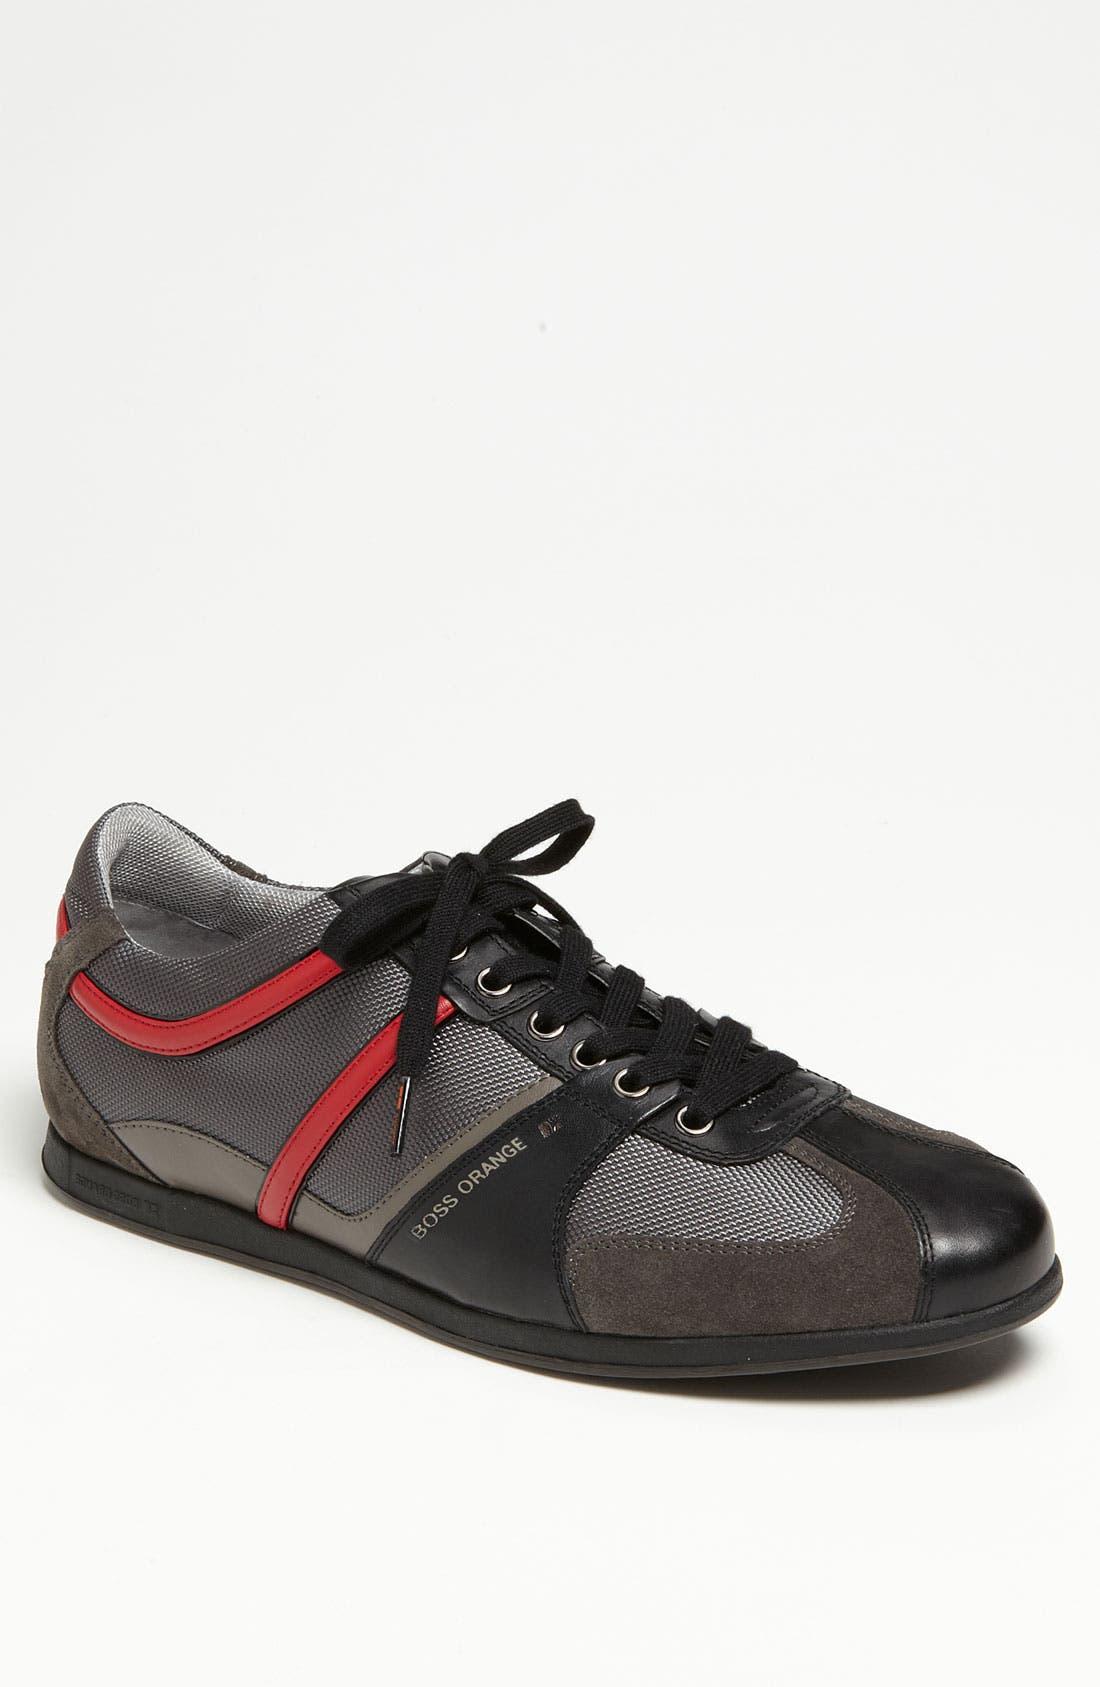 Alternate Image 1 Selected - BOSS Orange 'Simbad IV' Sneaker